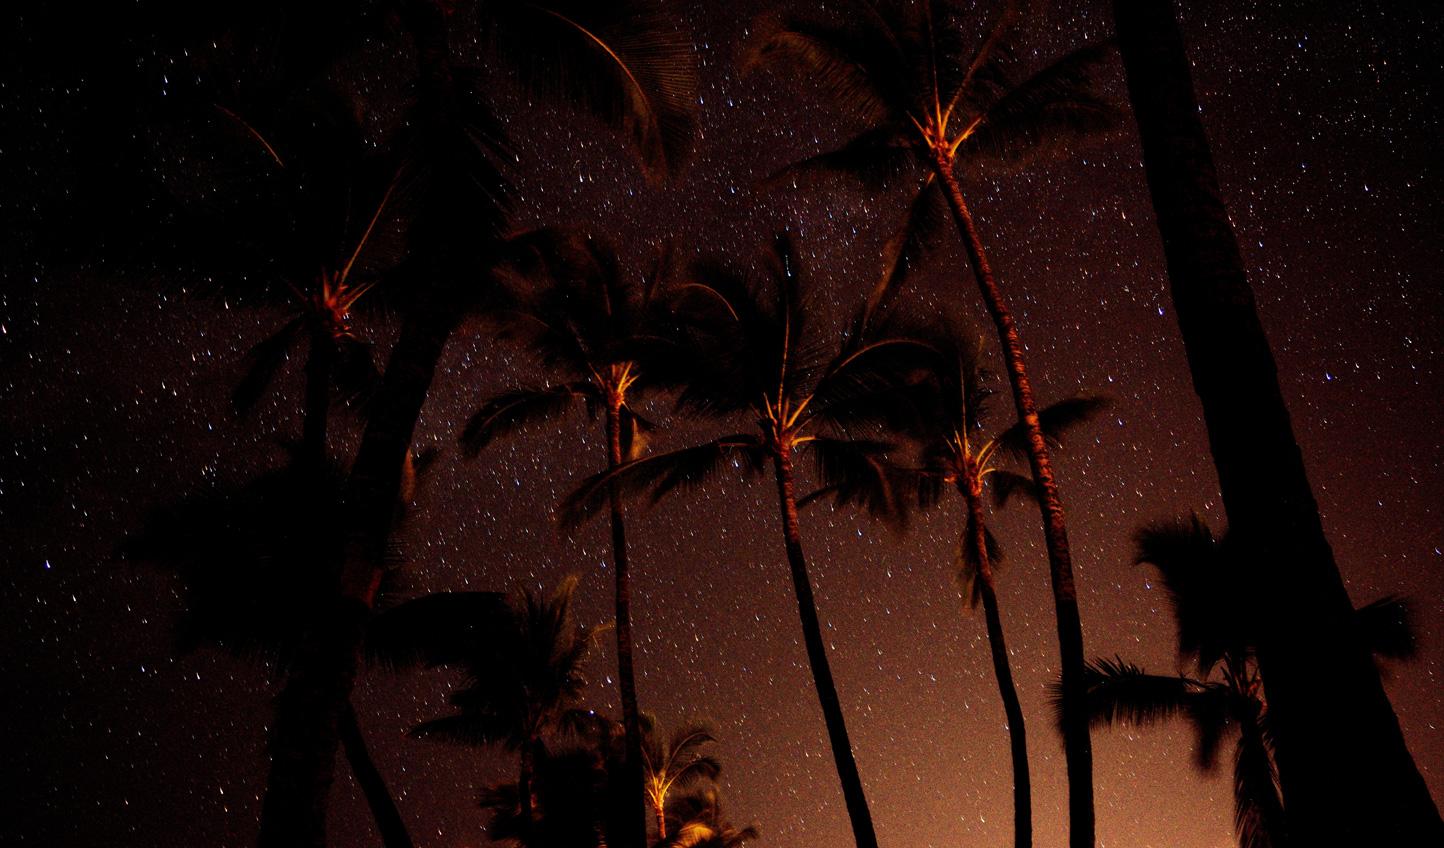 Watch the stars blaze across the sky by night